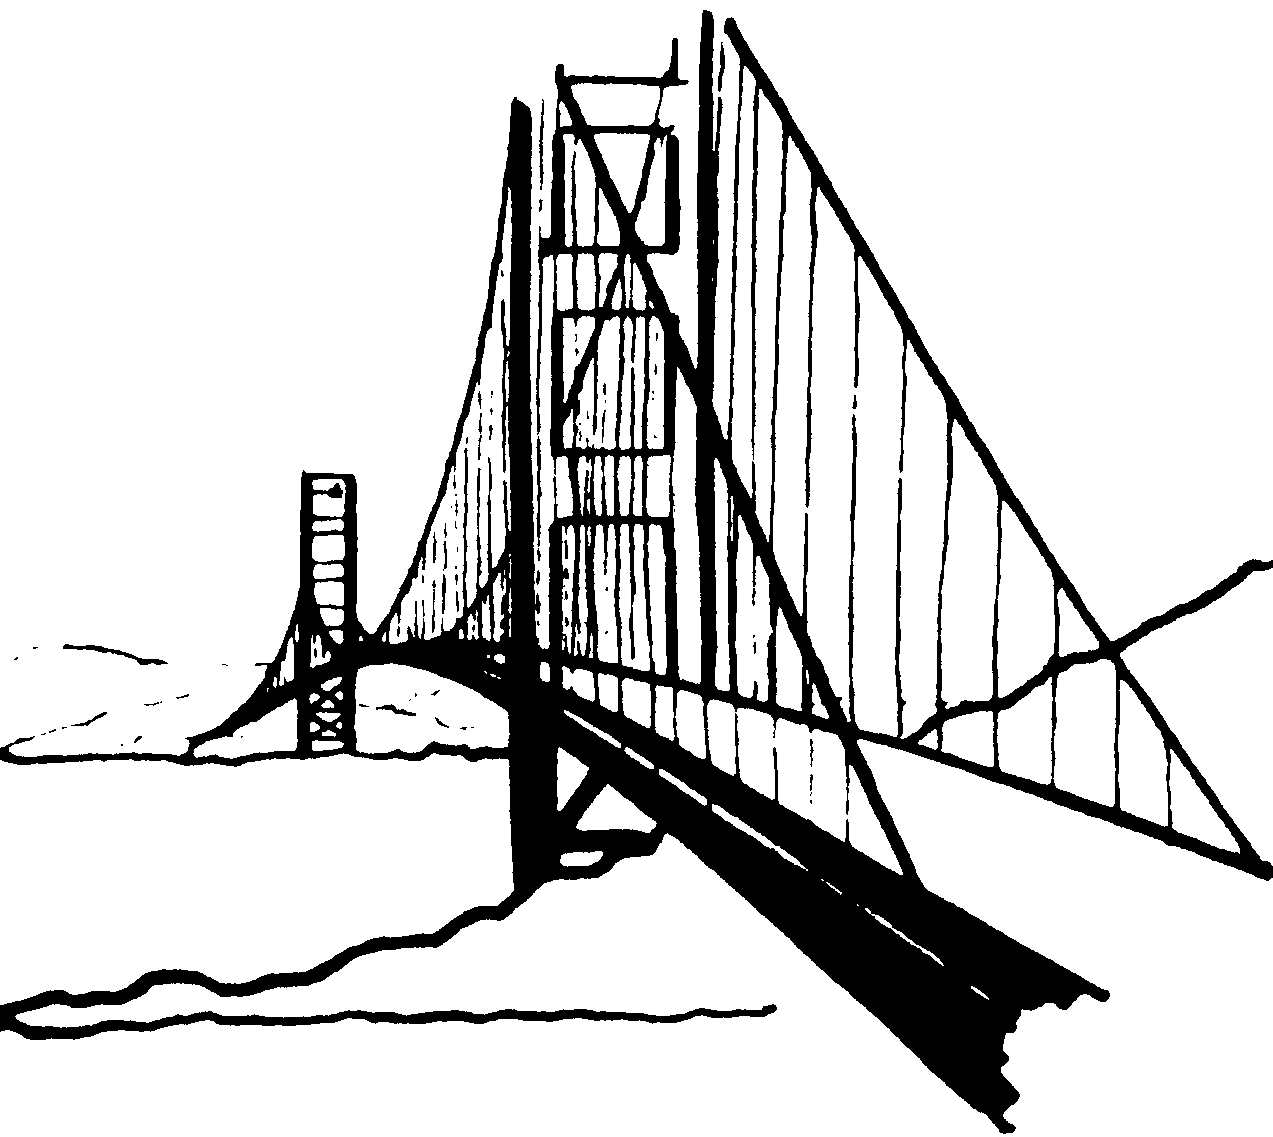 bridge clip art viewing clipart panda free clipart images rh clipartpanda com bridge clip art free images bridge clip art free